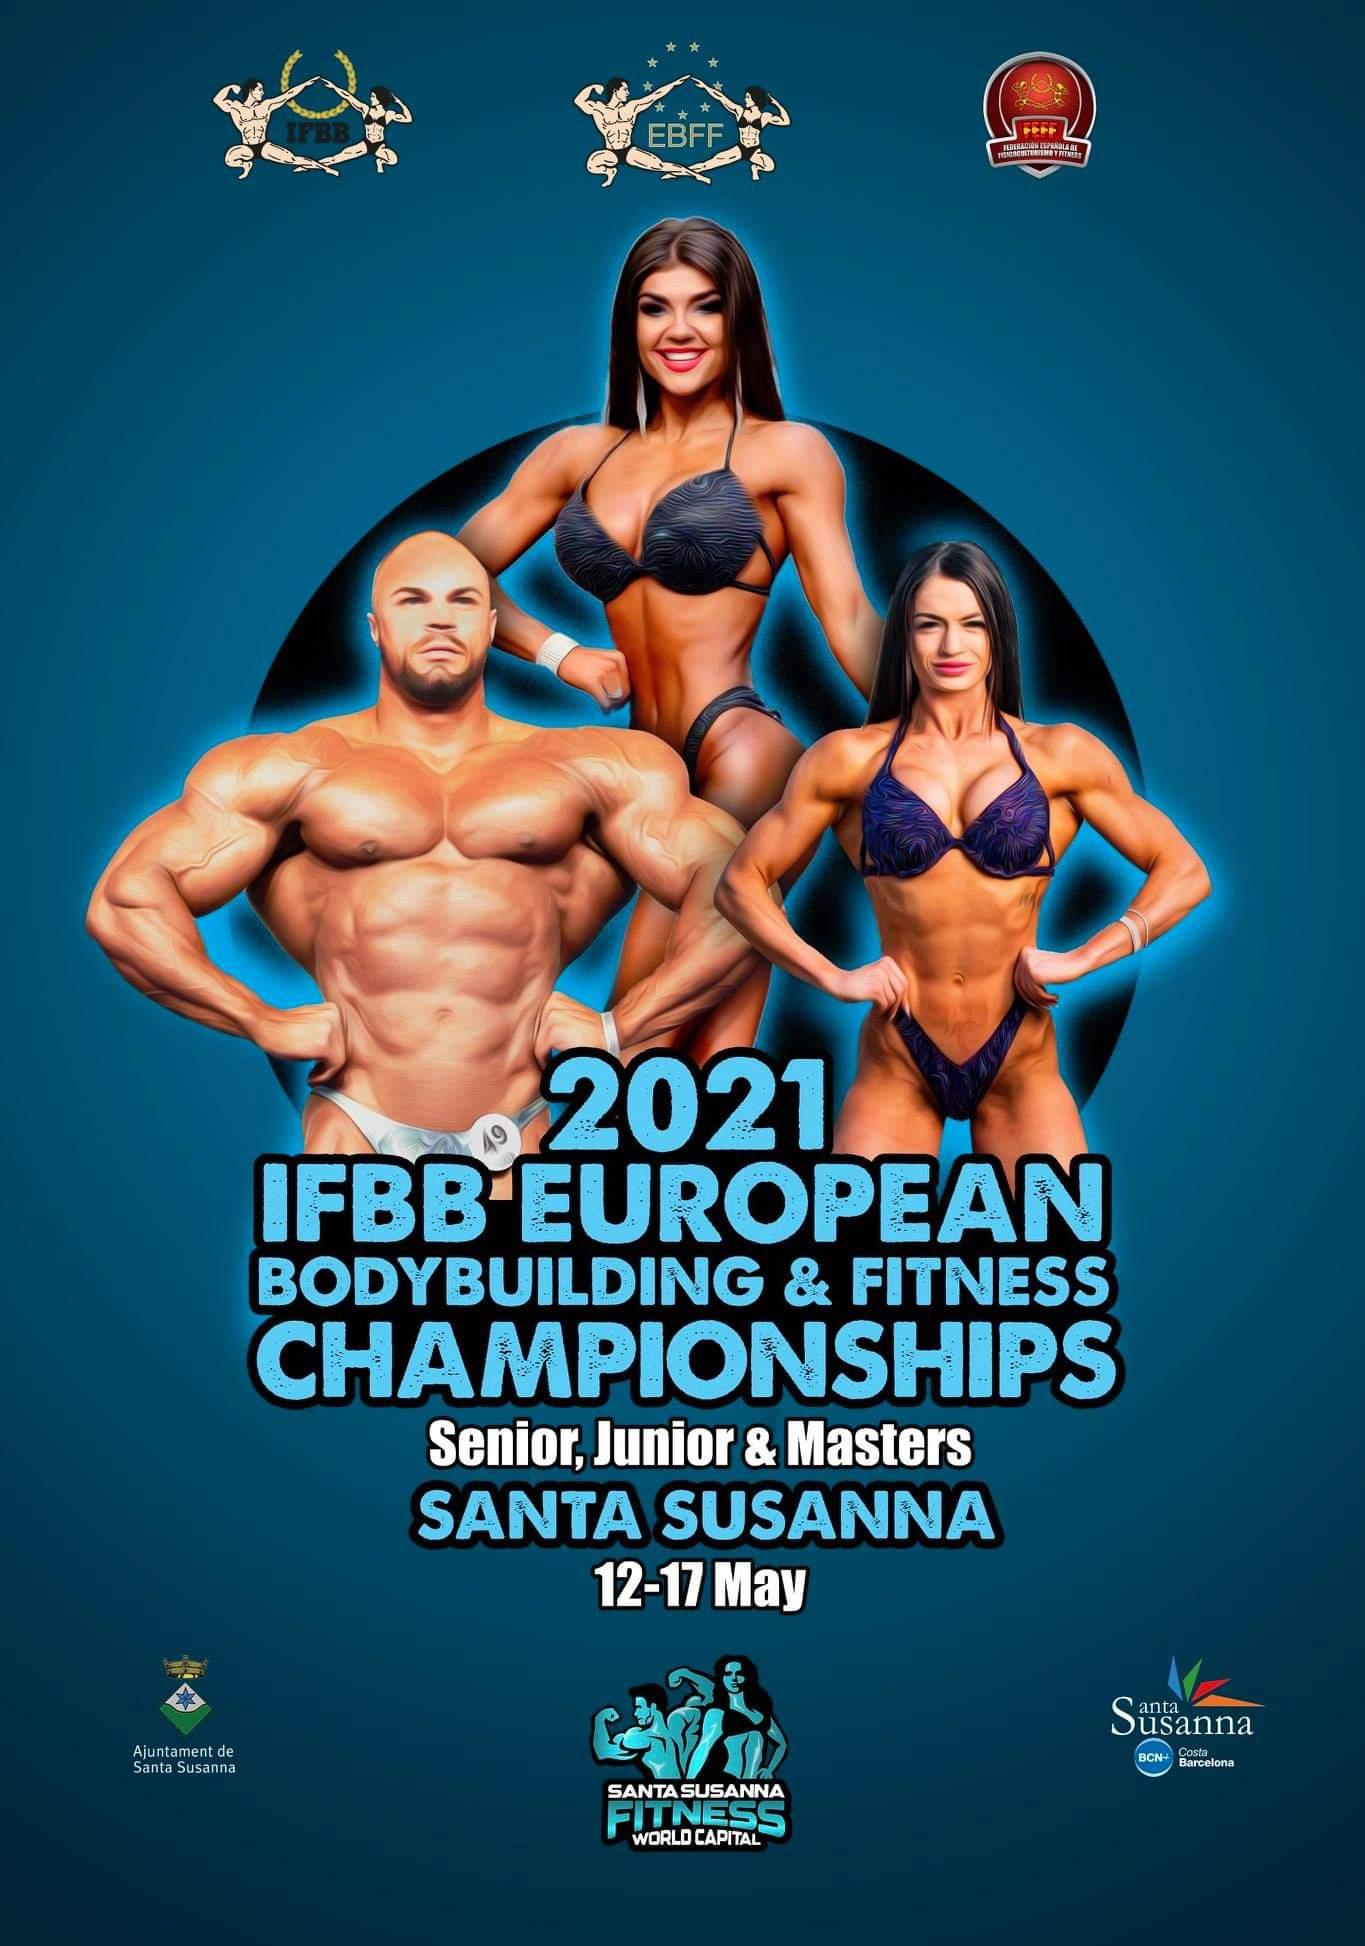 locandina 2021 ifbb european bodybuilding & fitness championships